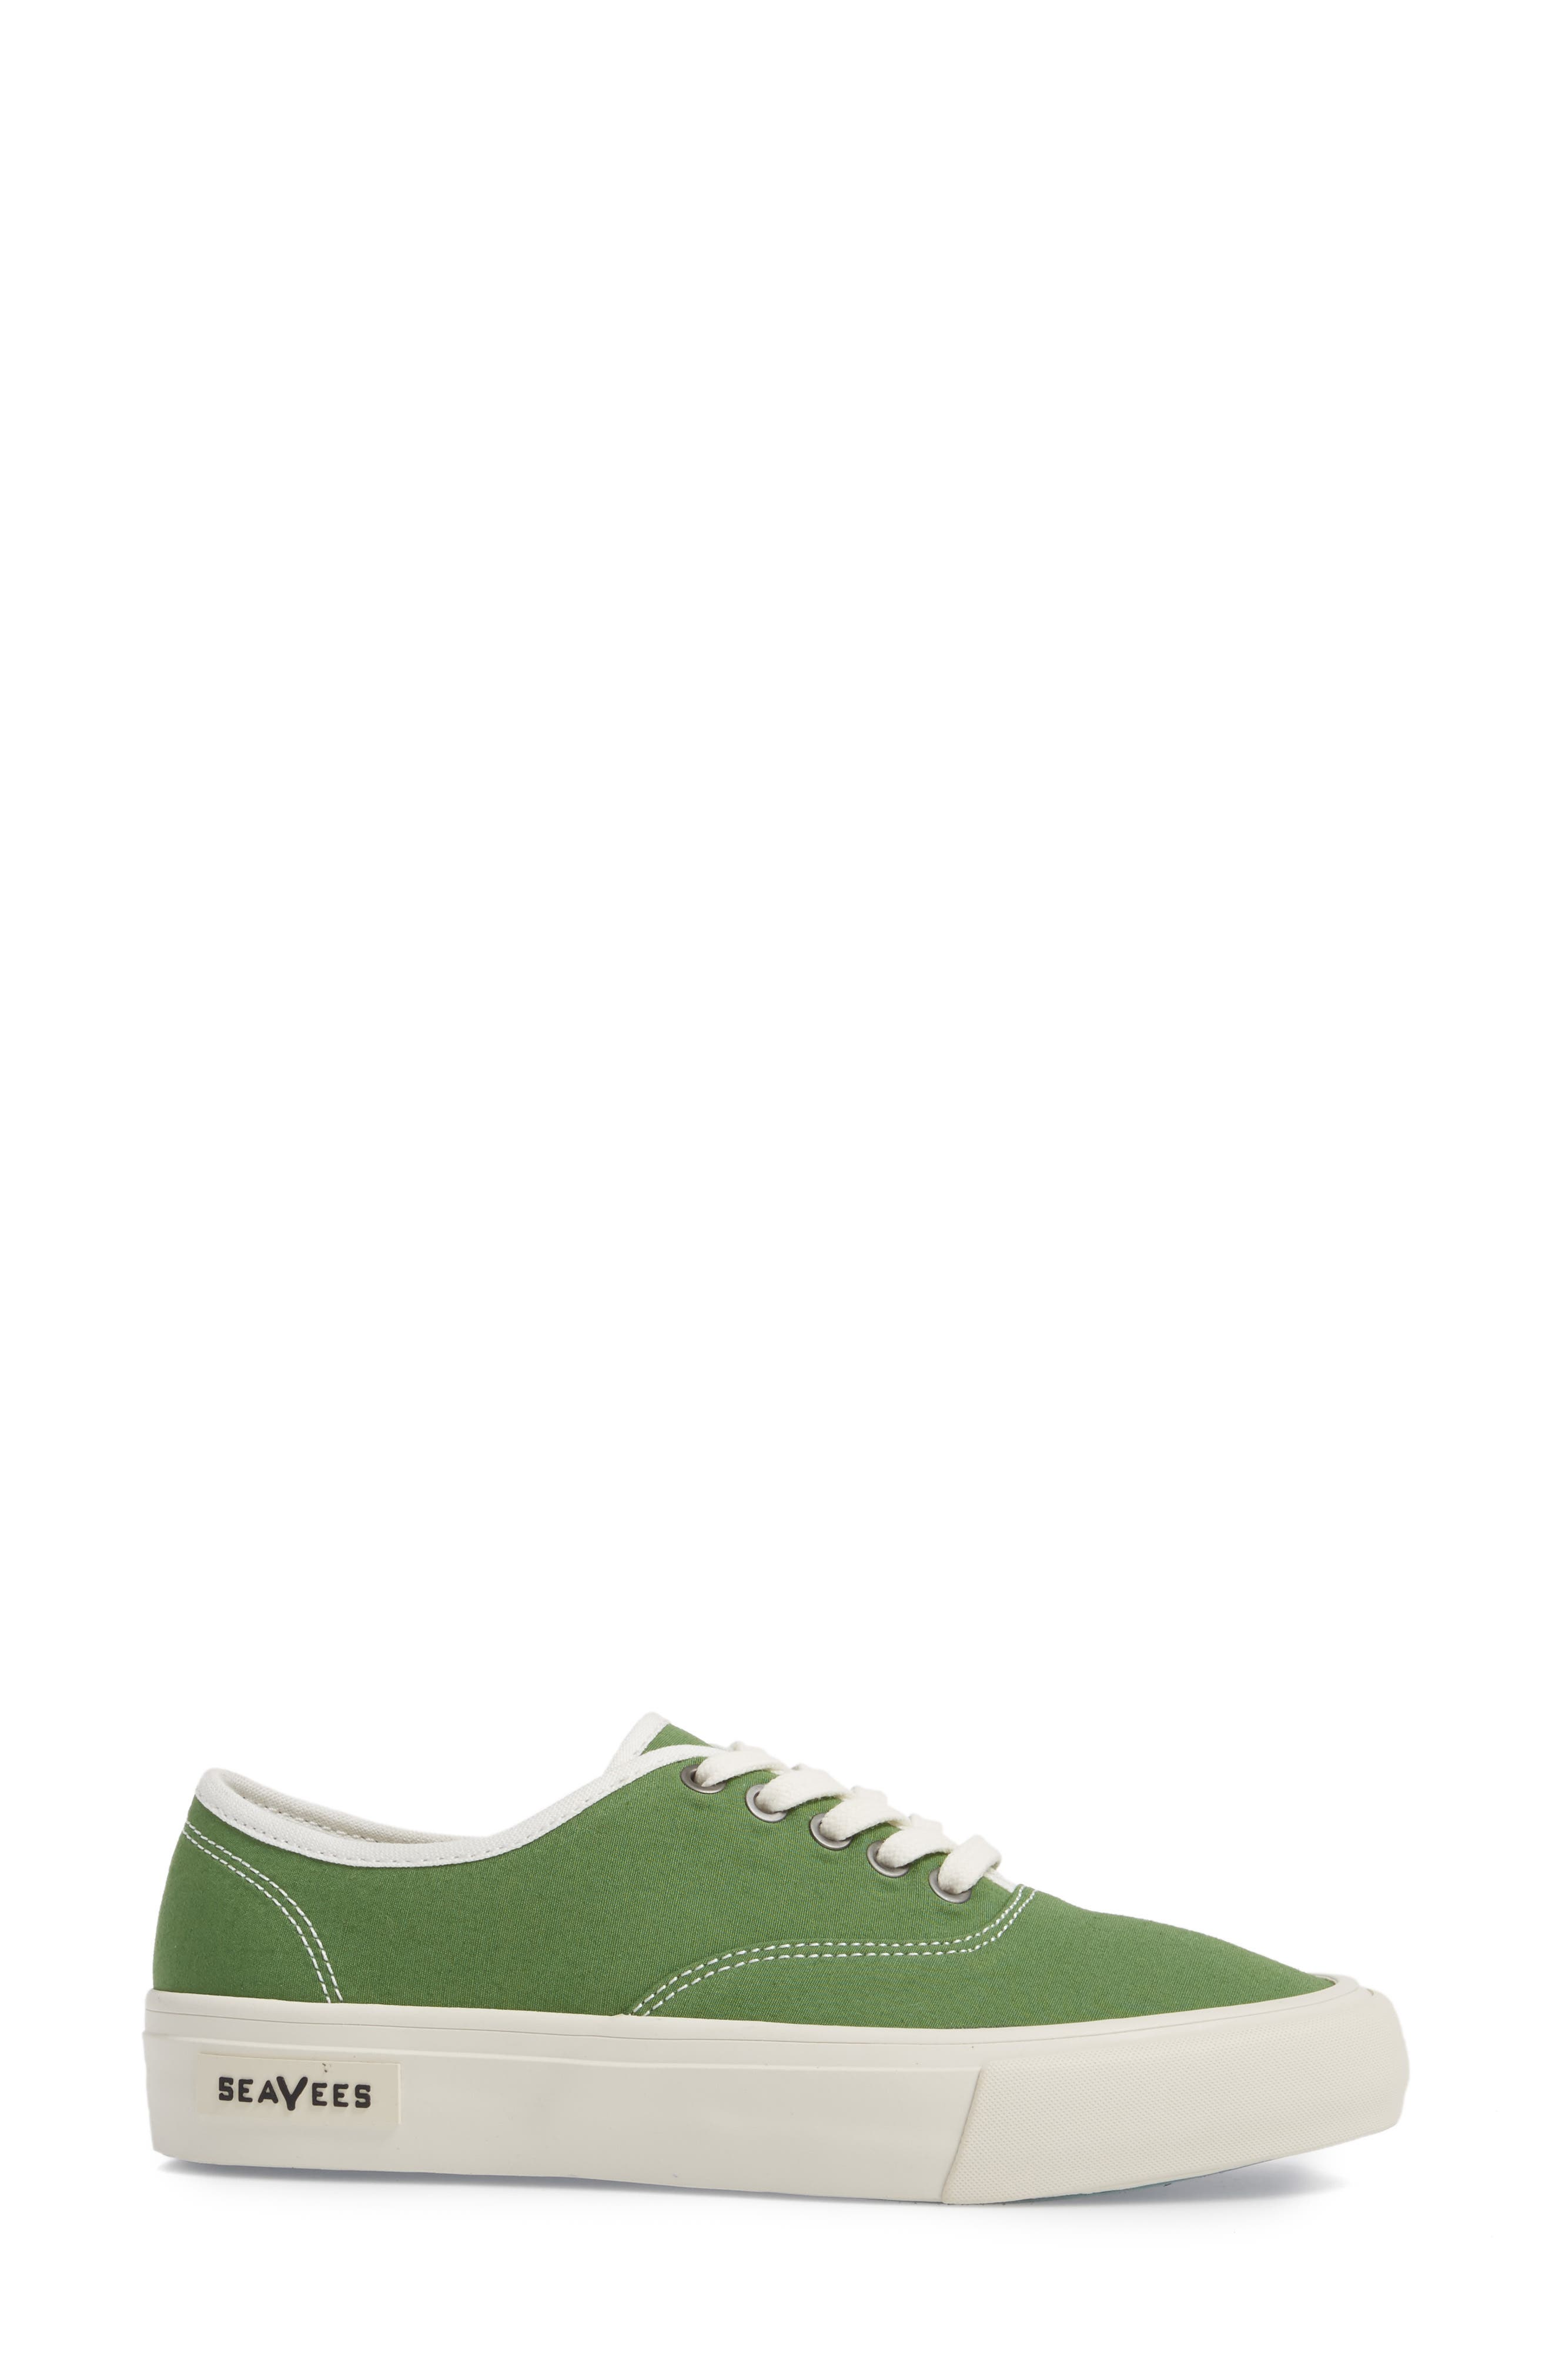 SEAVEES,                             Legend Standard Sneaker,                             Alternate thumbnail 3, color,                             CACTUS